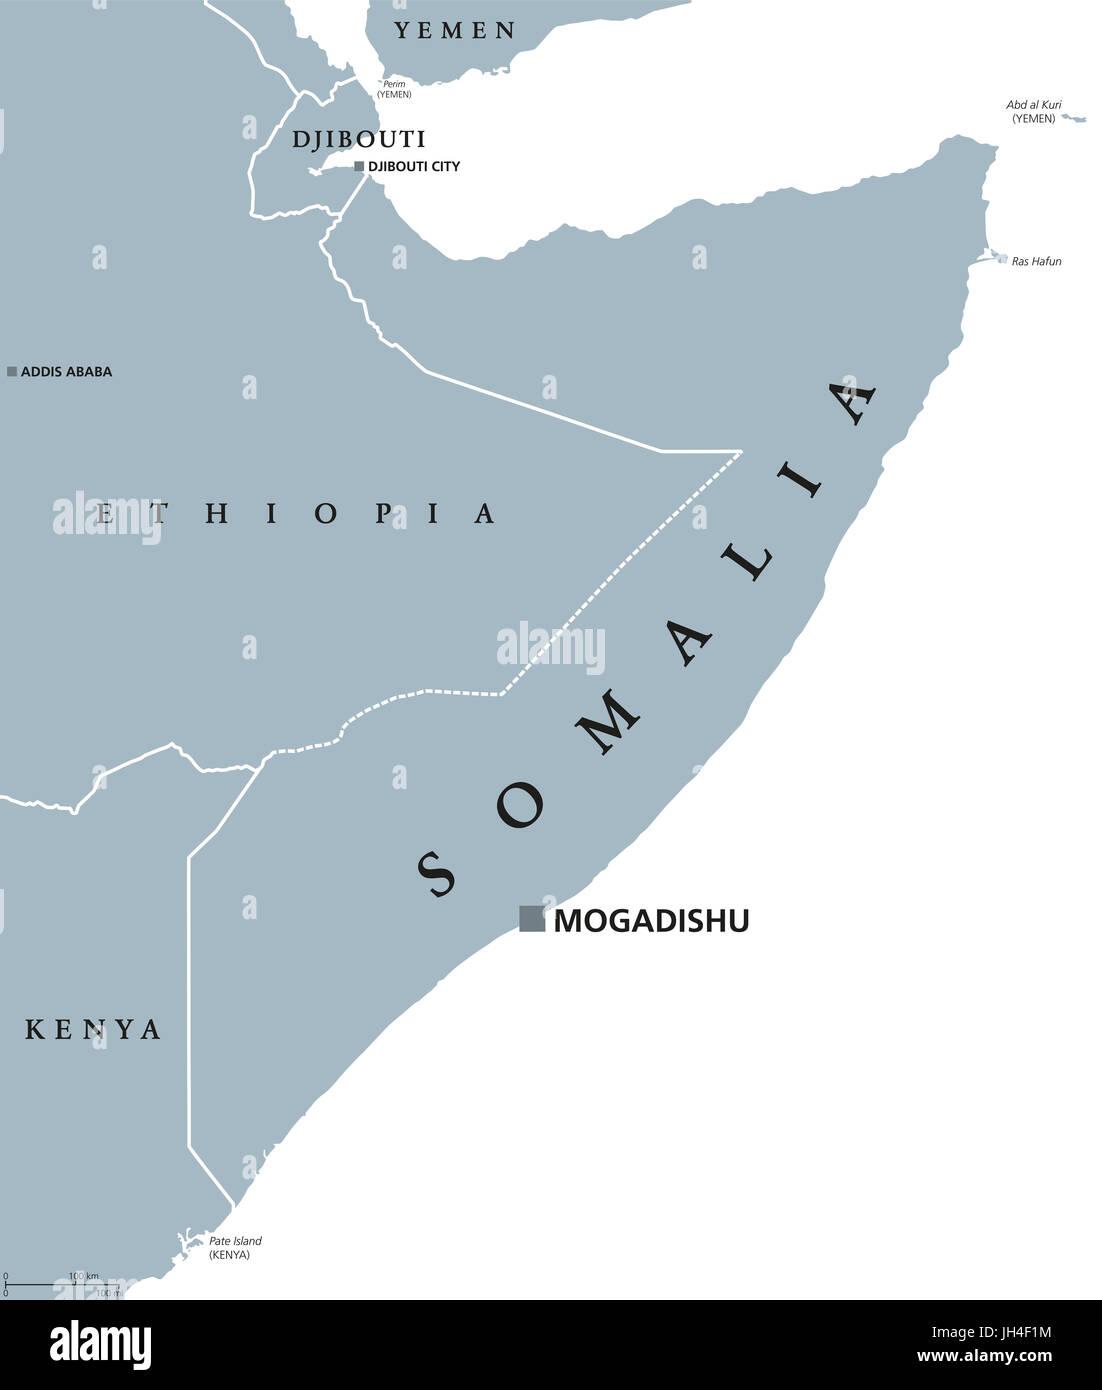 Mogadishu Africa Map.Somalia Political Map With Capital Mogadishu Federal